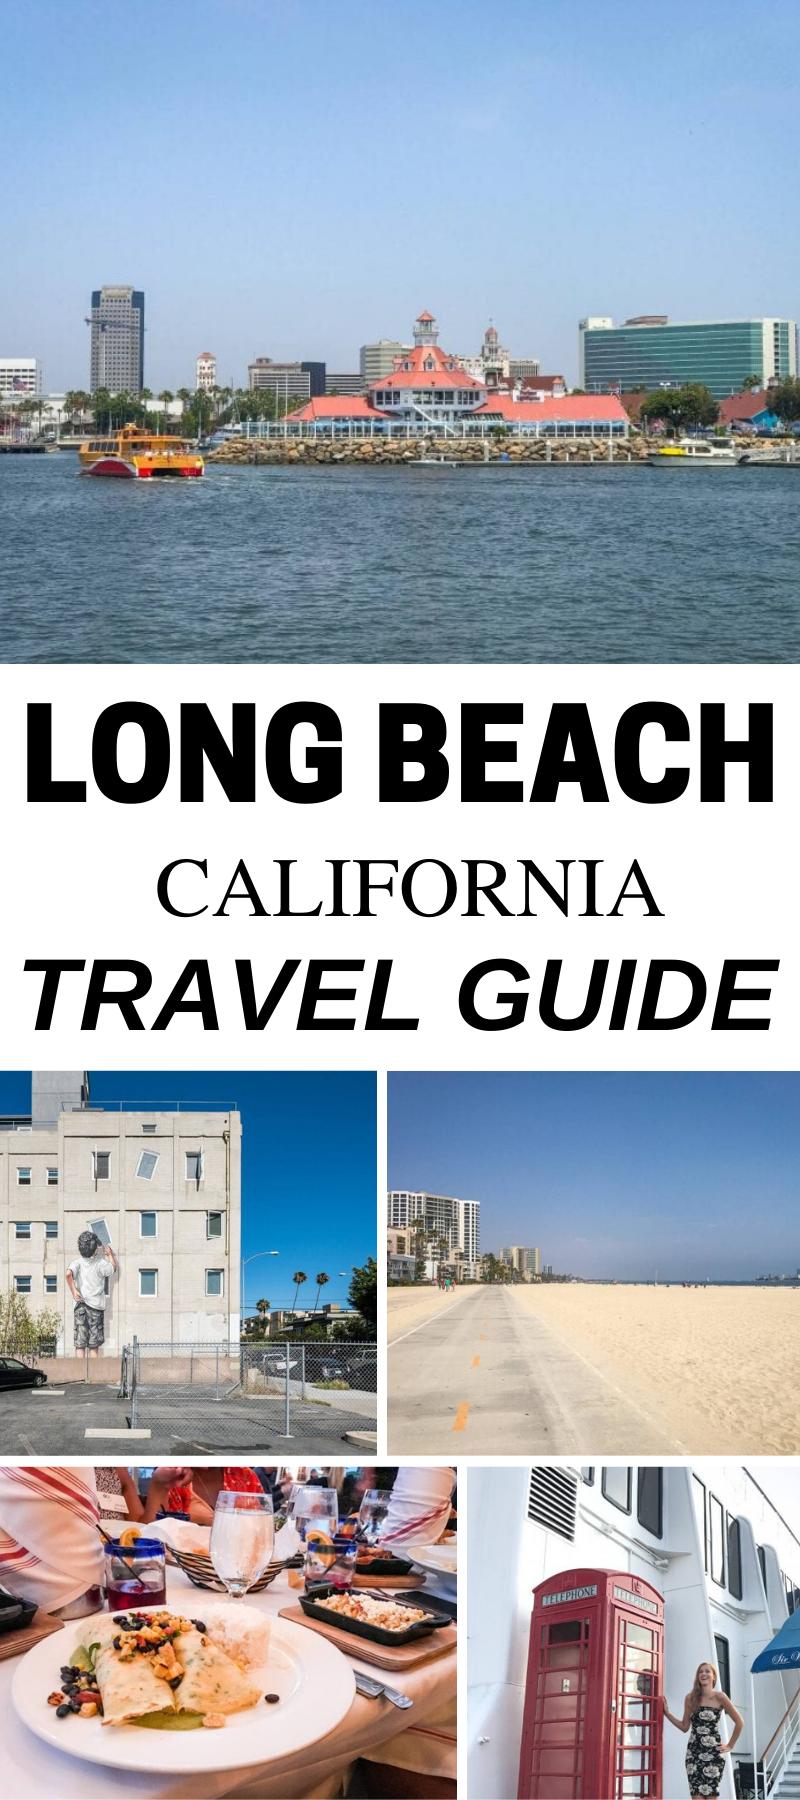 Things To Do In Long Beach Ca Anna Everywhere In 2020 Long Beach California California Travel Guide California Travel